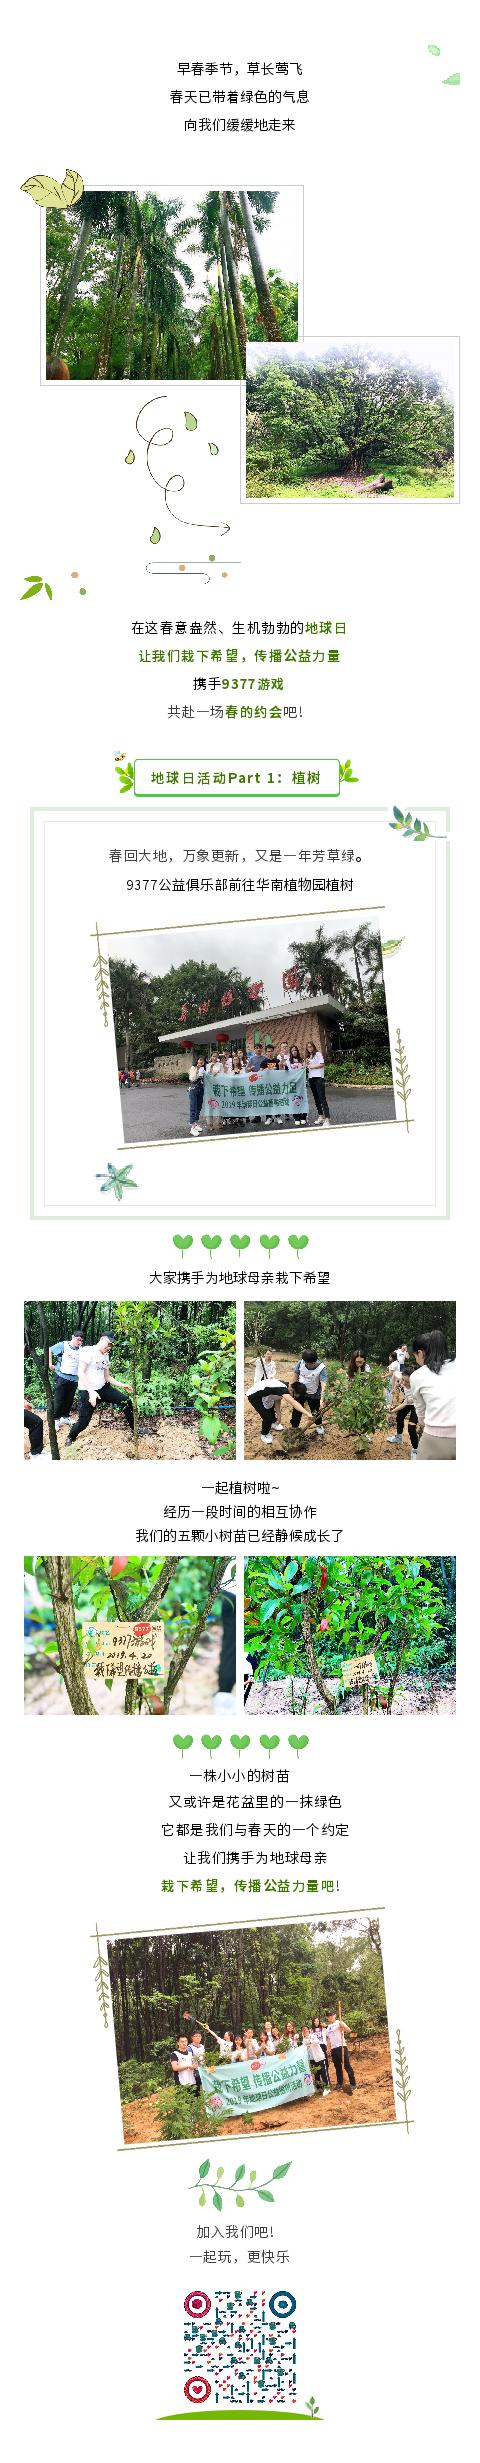 植树节11.png